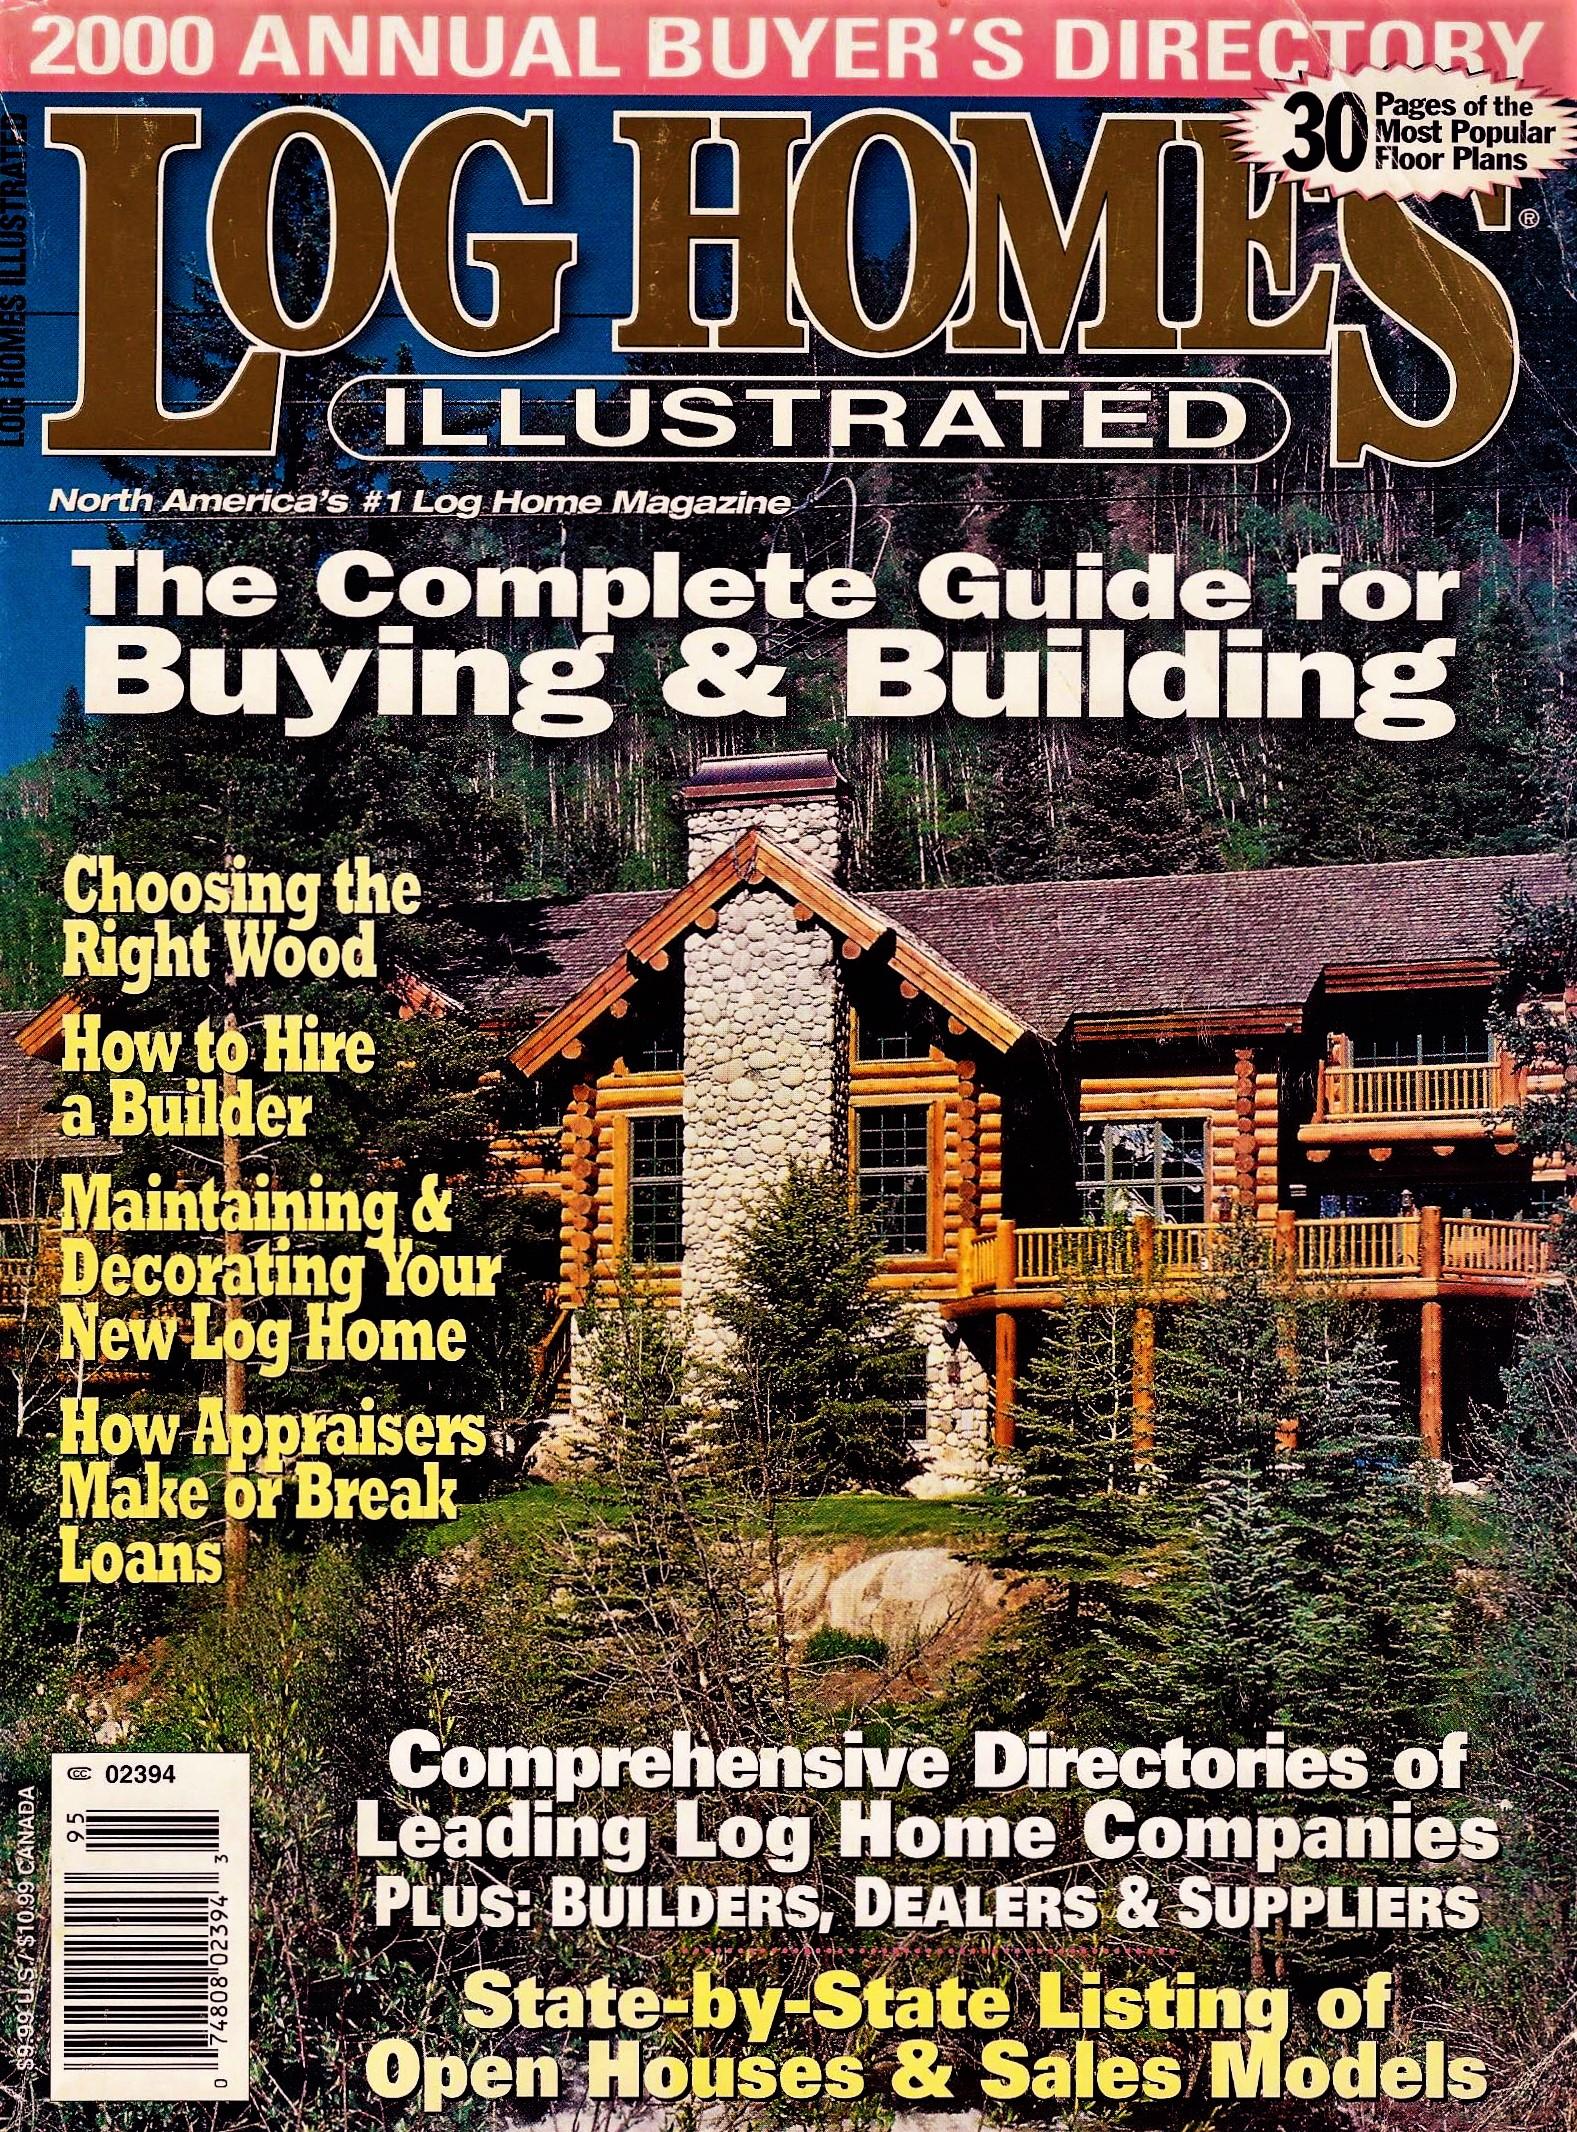 Log home cover .1.jpg